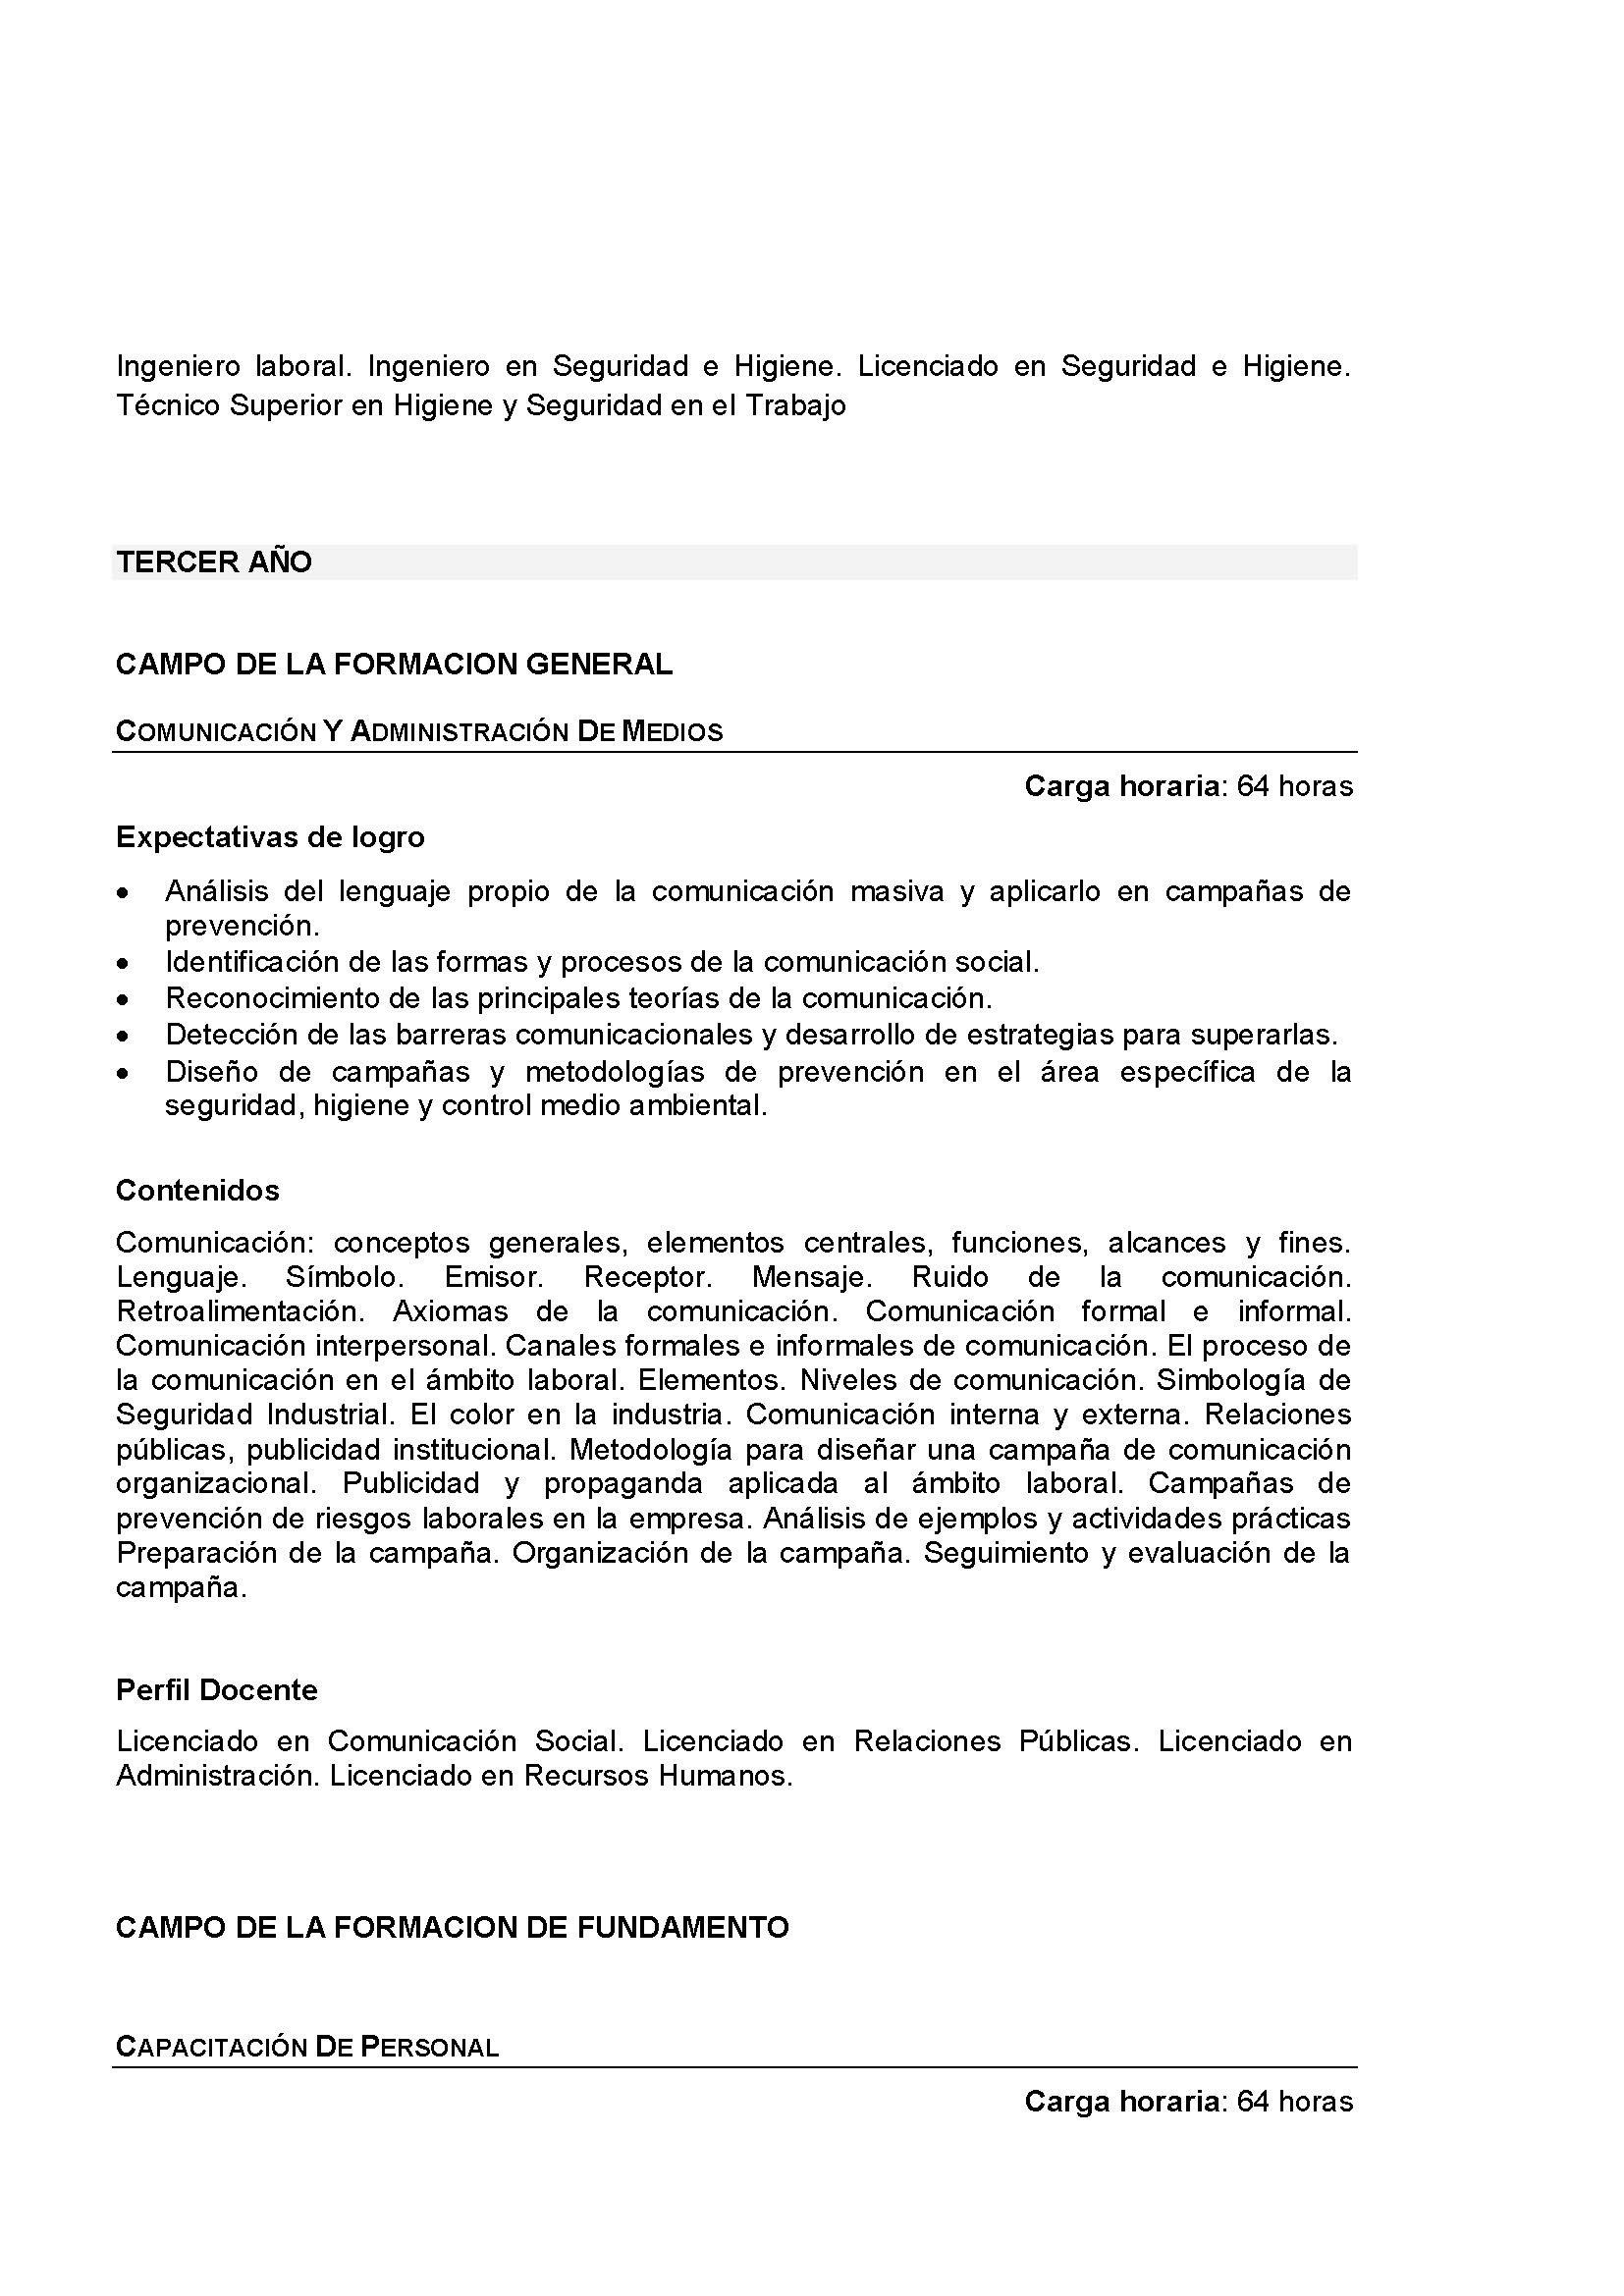 320-13 TS Seg e Hig Final (Plan Nuevo)_Page_26